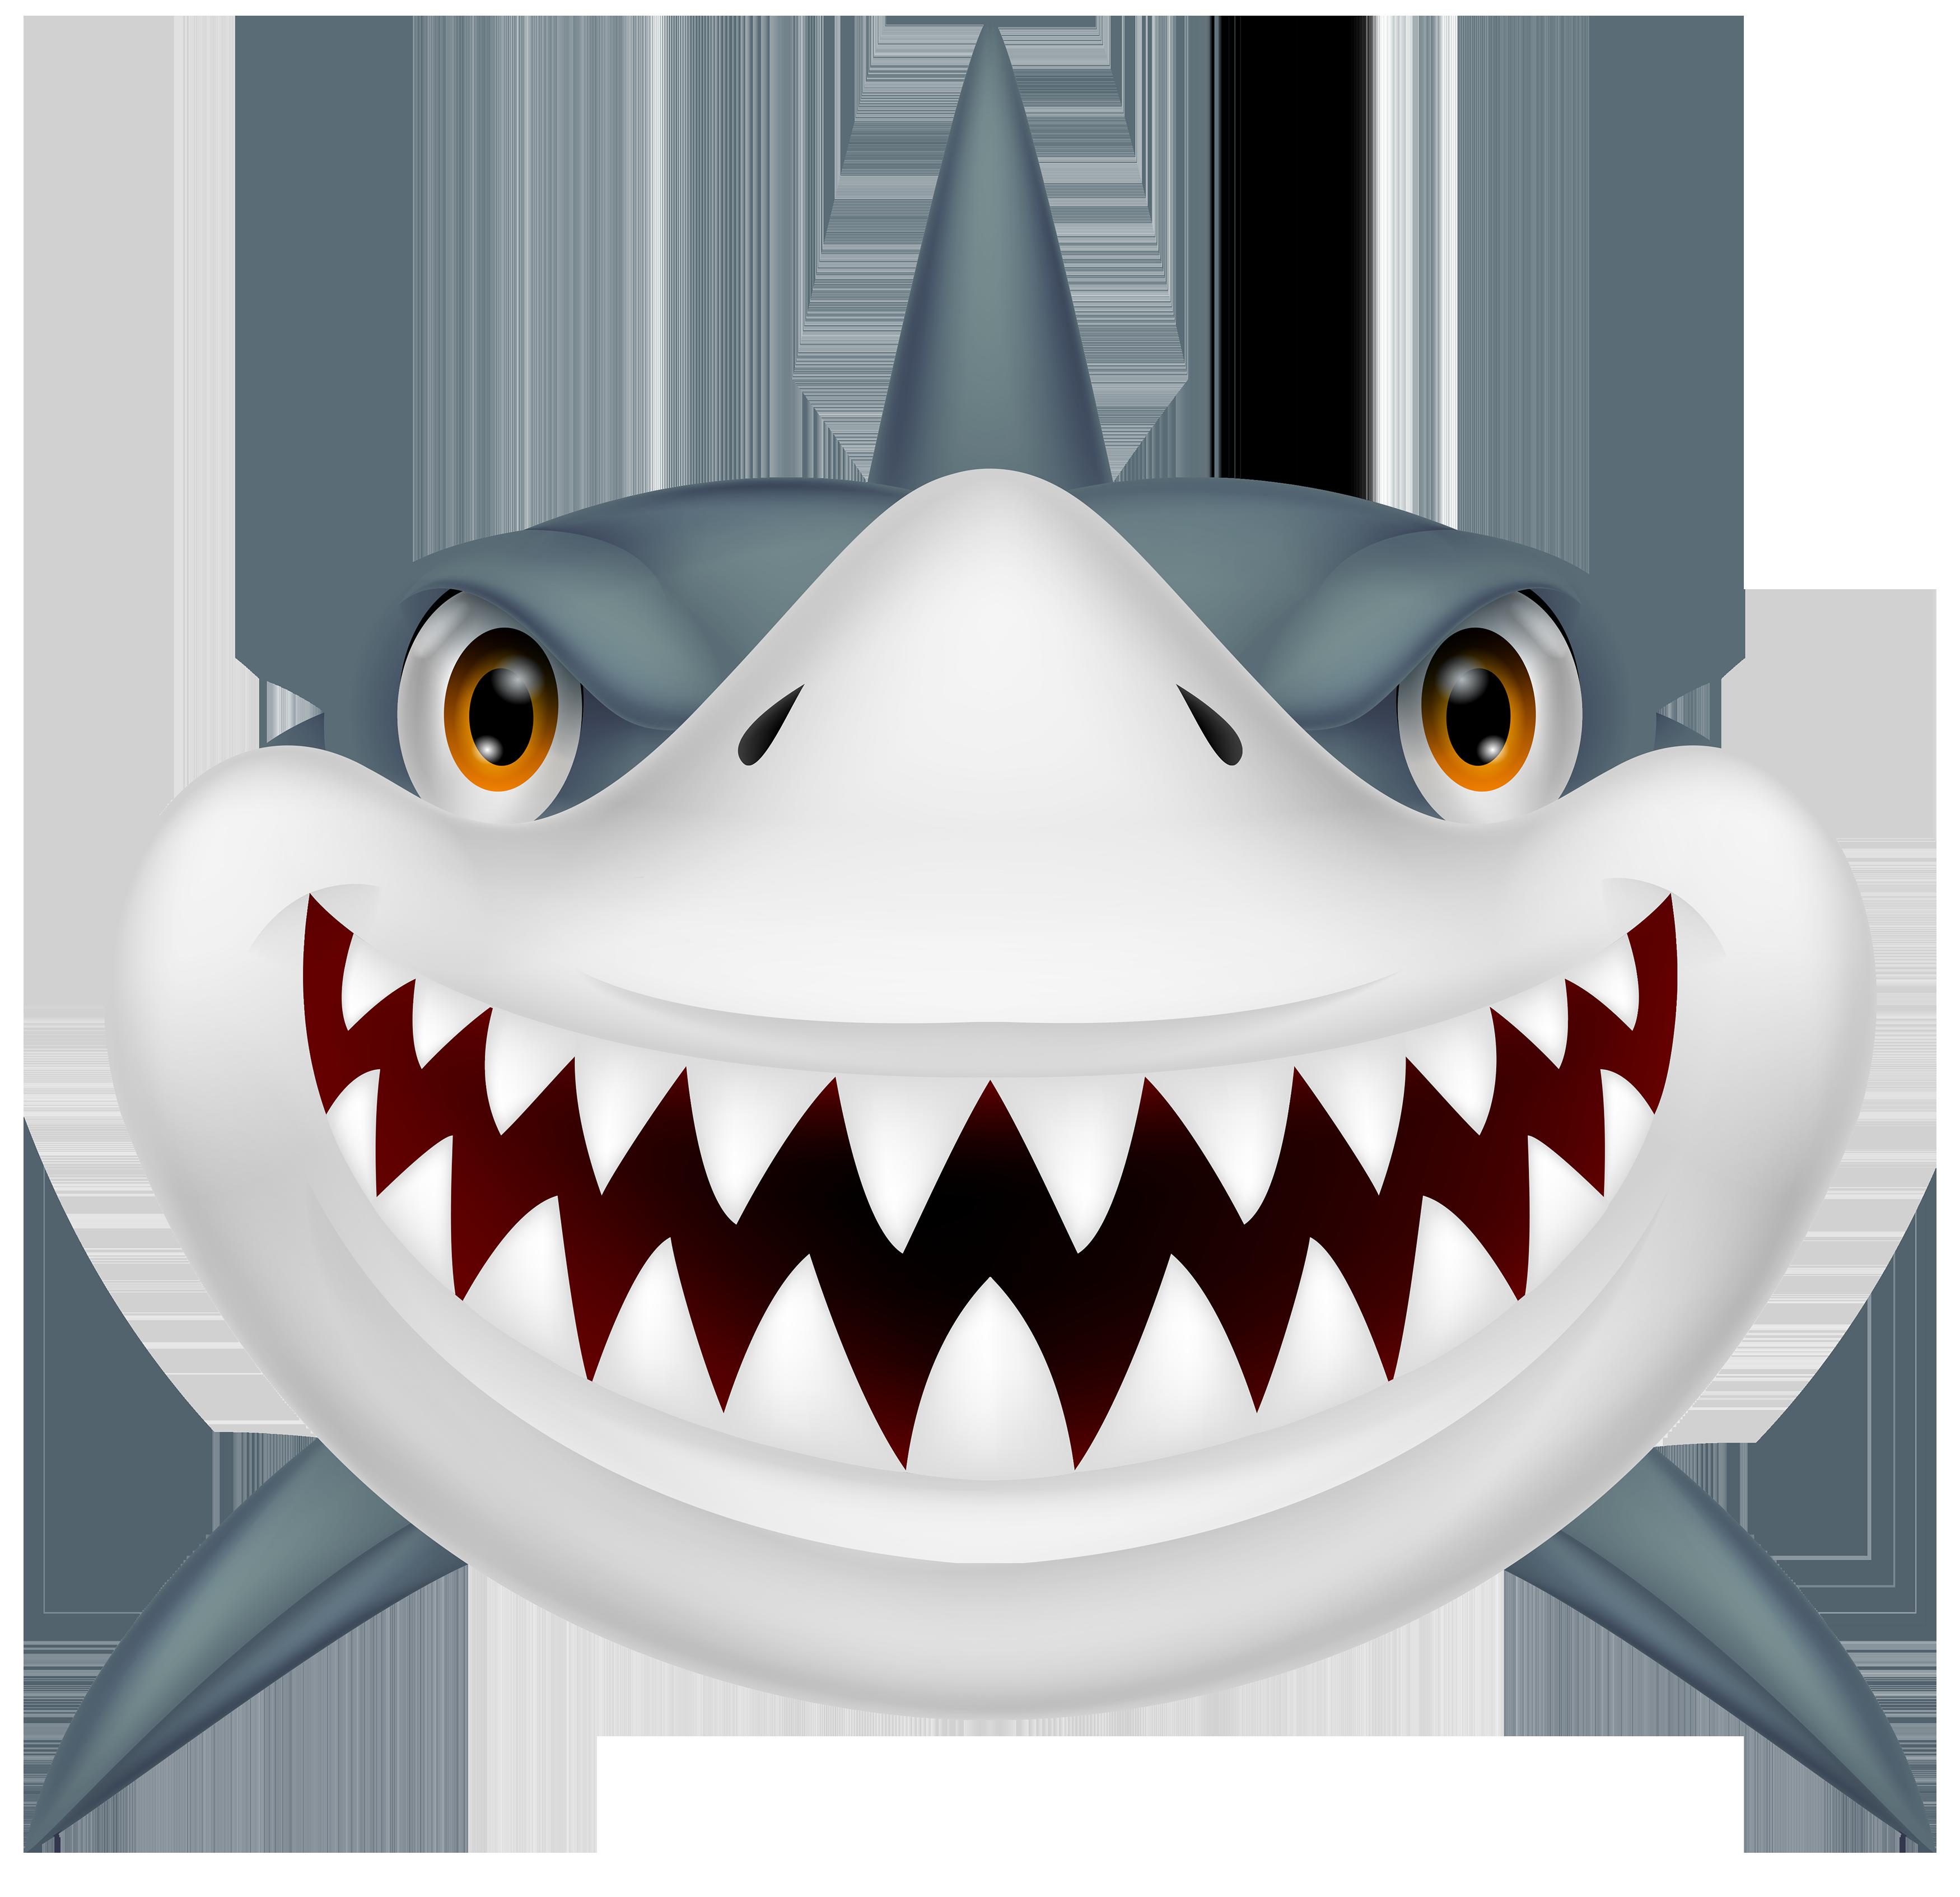 Pin By Therx Rzr On Tipsy S Tidbits Treats Shark Painting Free Clip Art Shark Images